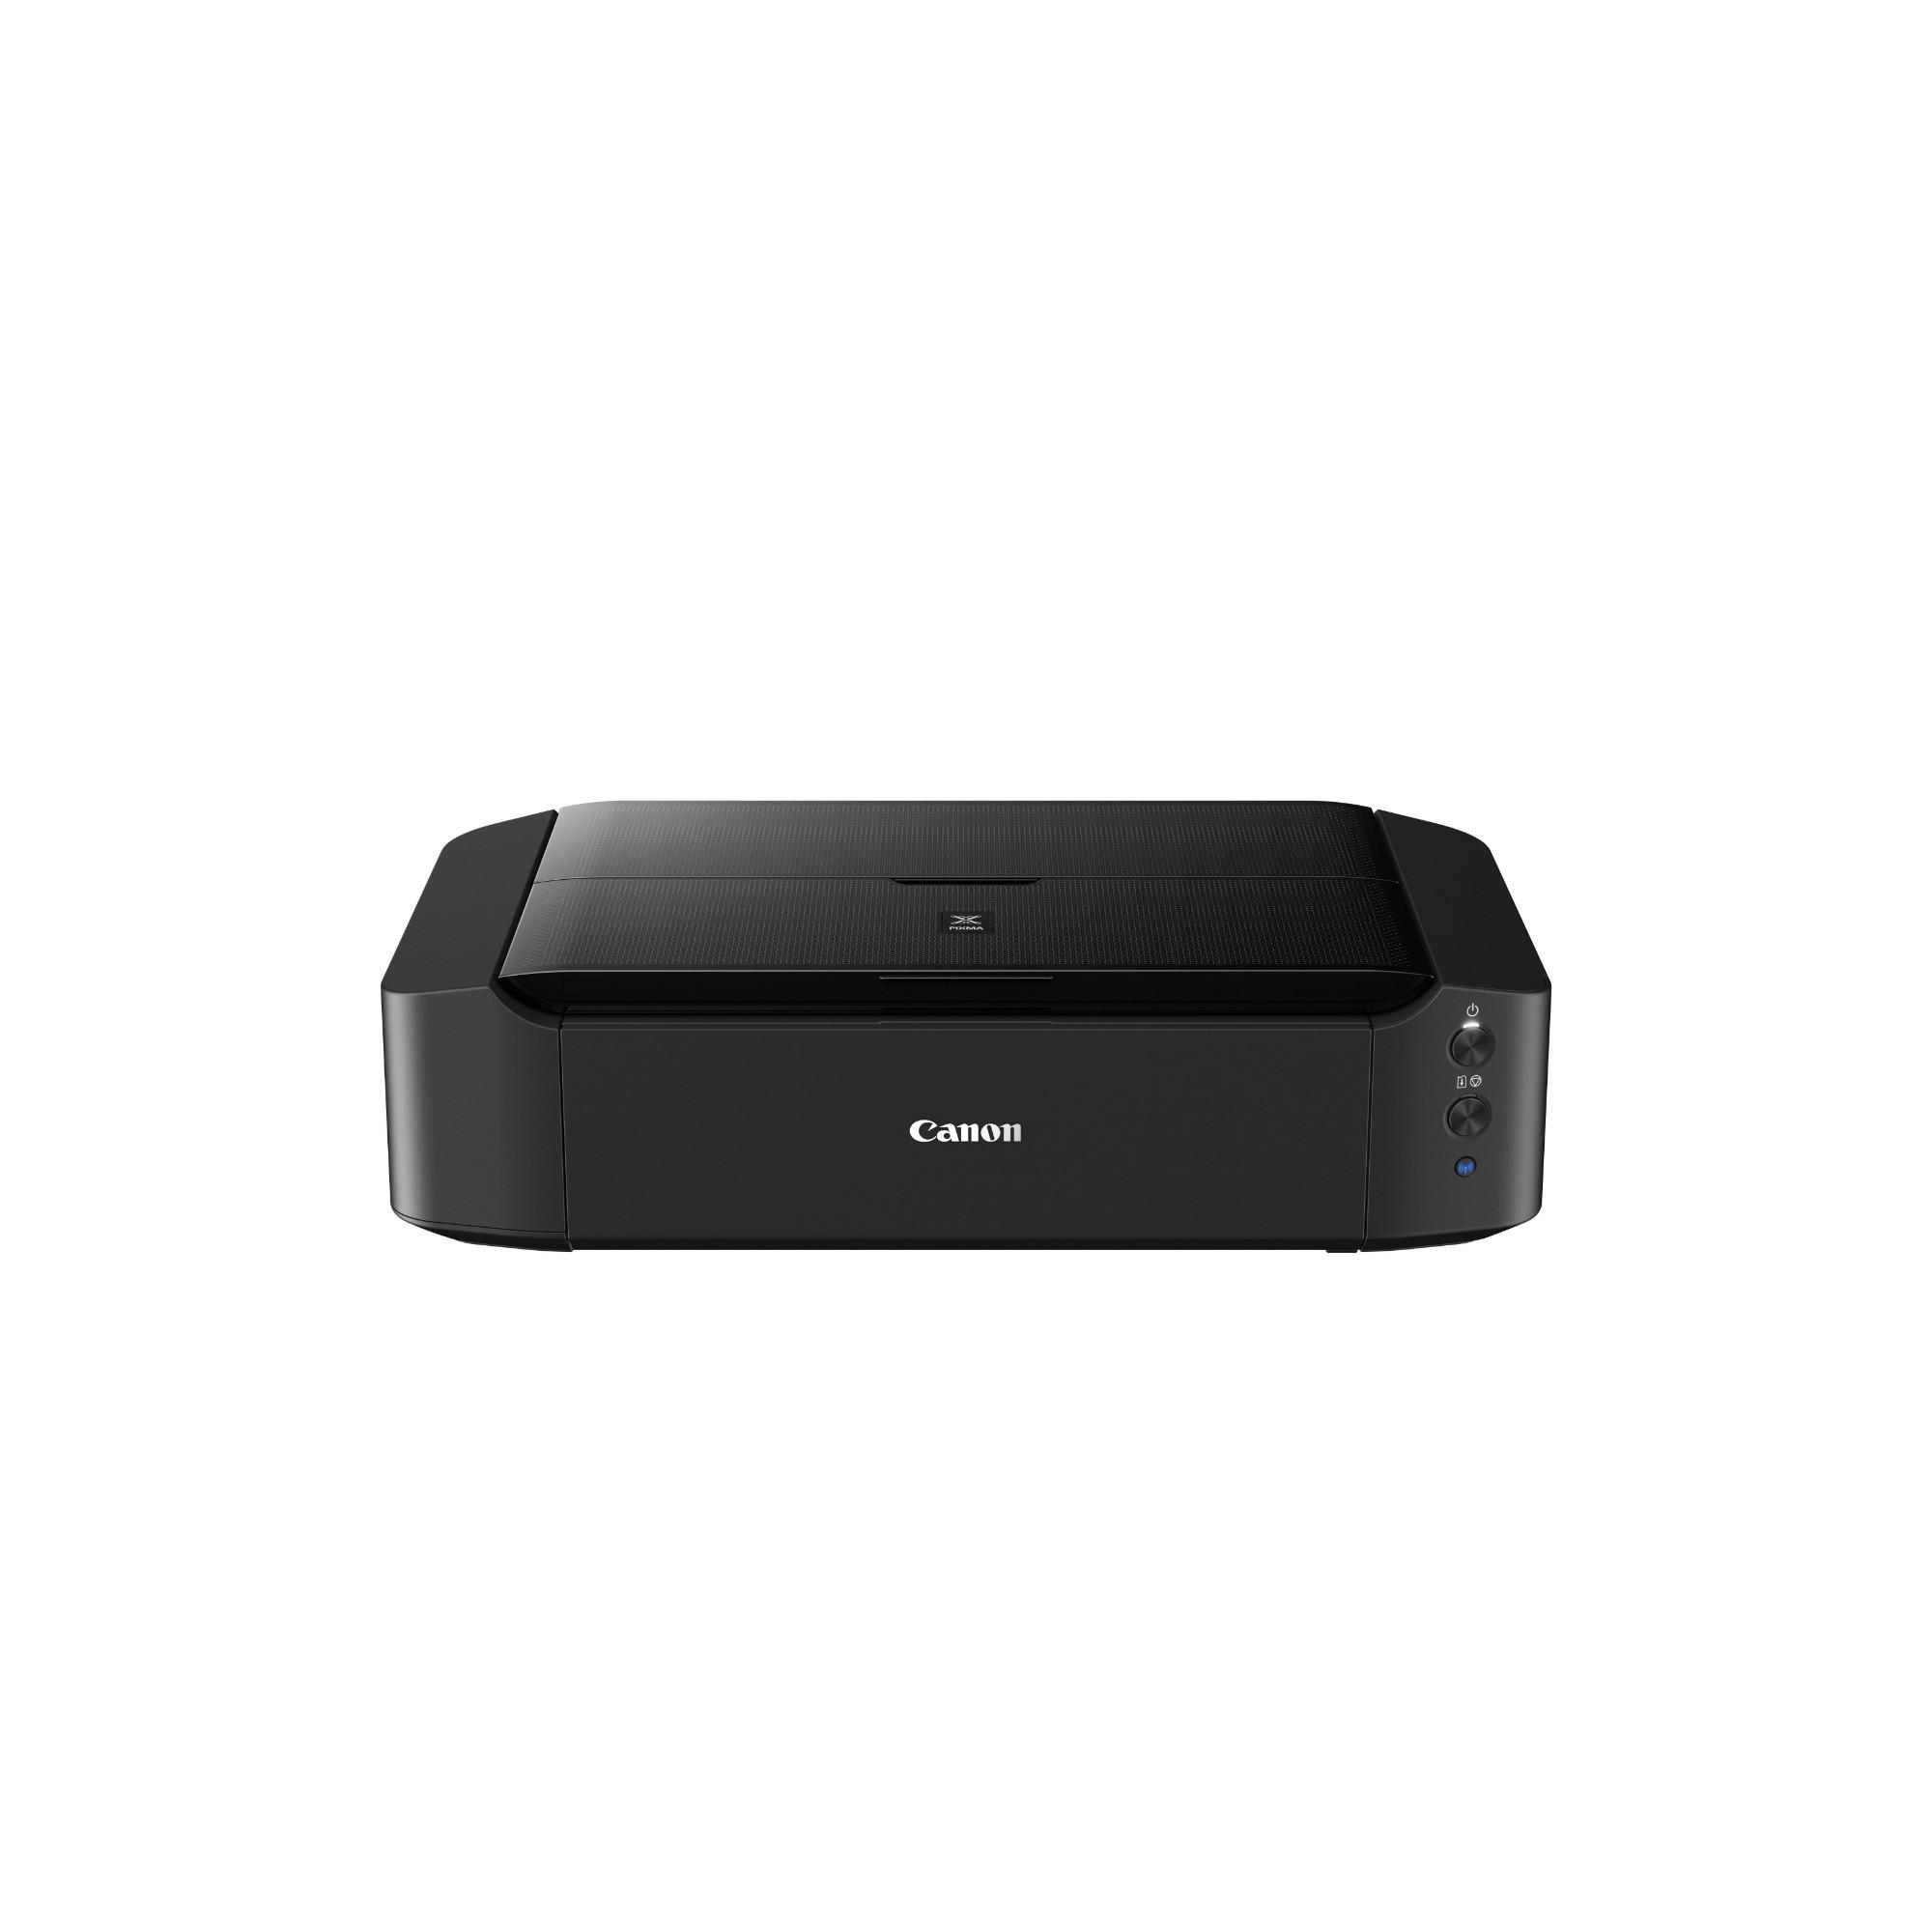 Canon PIXMA iP8750 impresora de foto Inyección de tinta 9600 x 2400 DPI A3+ (330 x 483 mm) Wifi